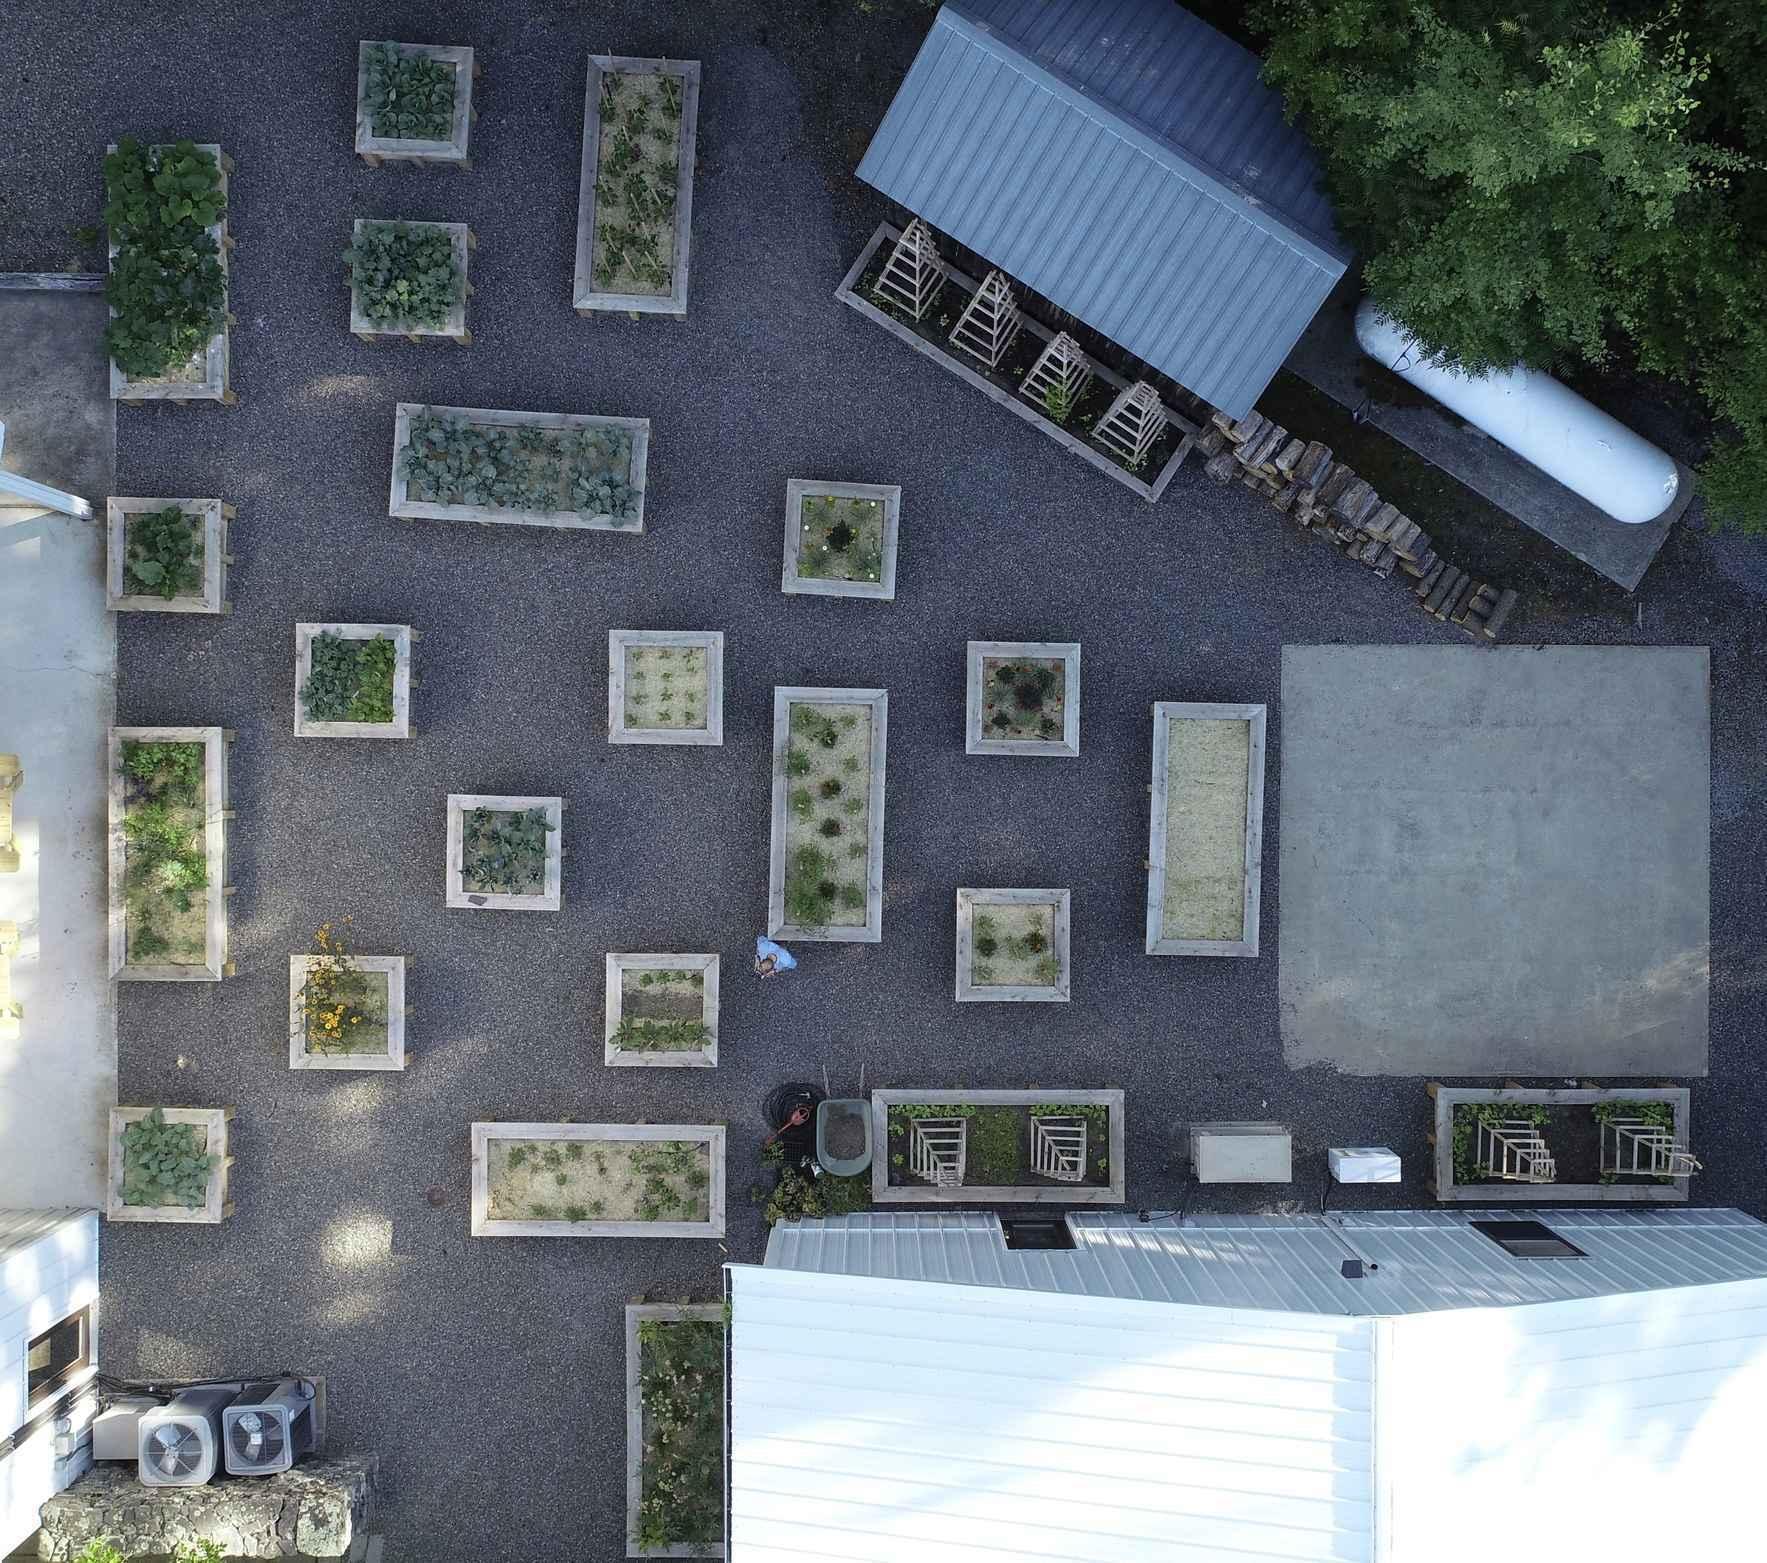 PRC Garden Bed image